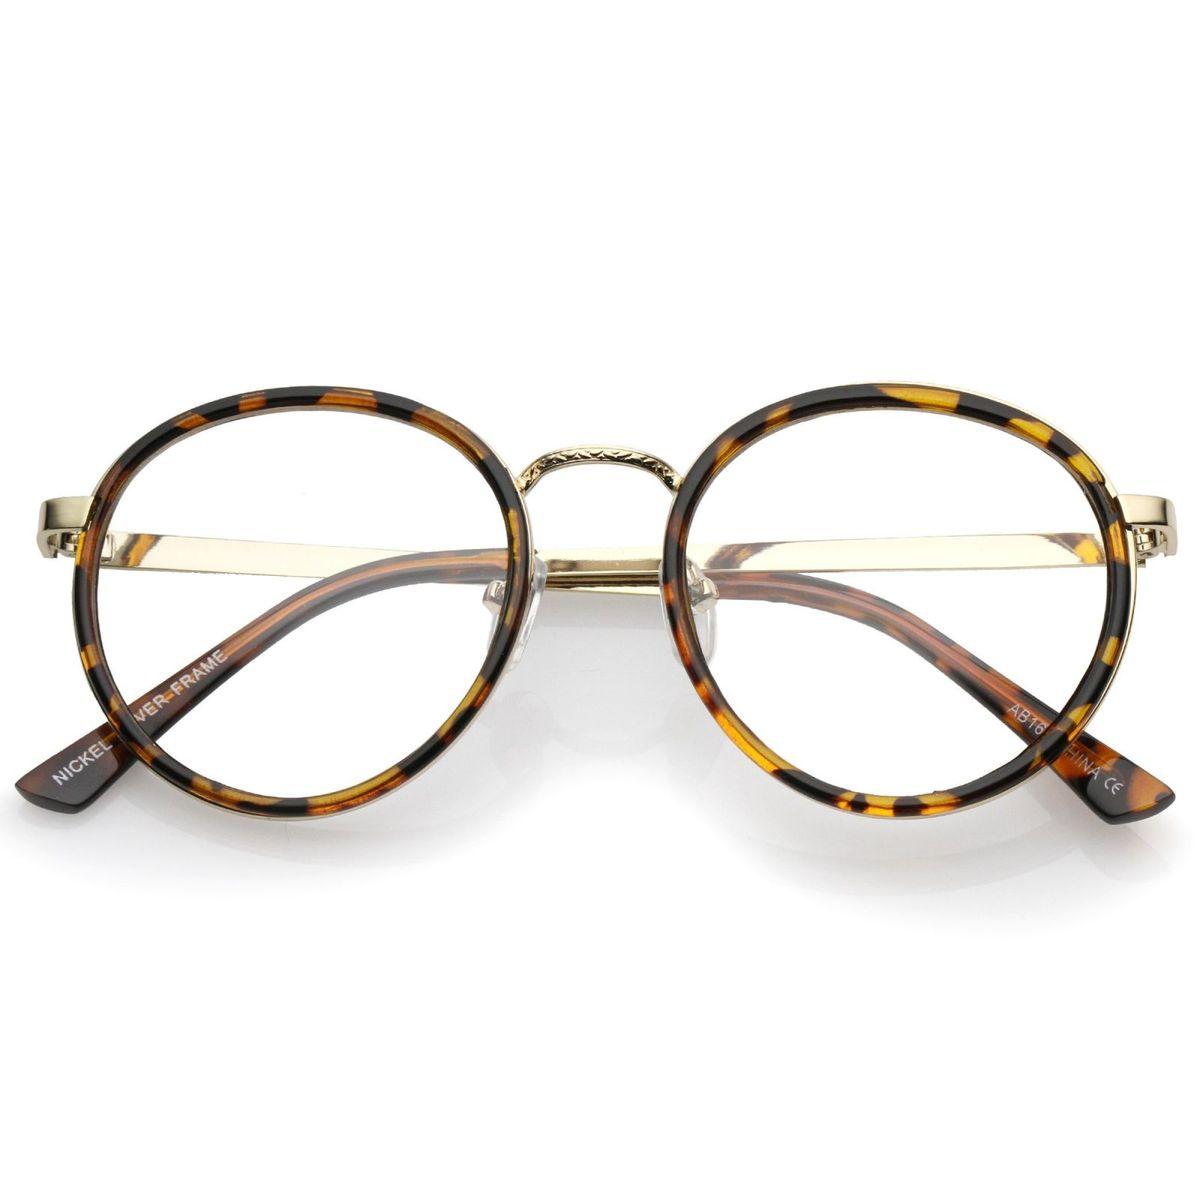 4f33886c7 Armação Óculos Redondo - Tartarugado - Unissex | Óculos Feminino Nunca  Usado 21535523 | enjoei